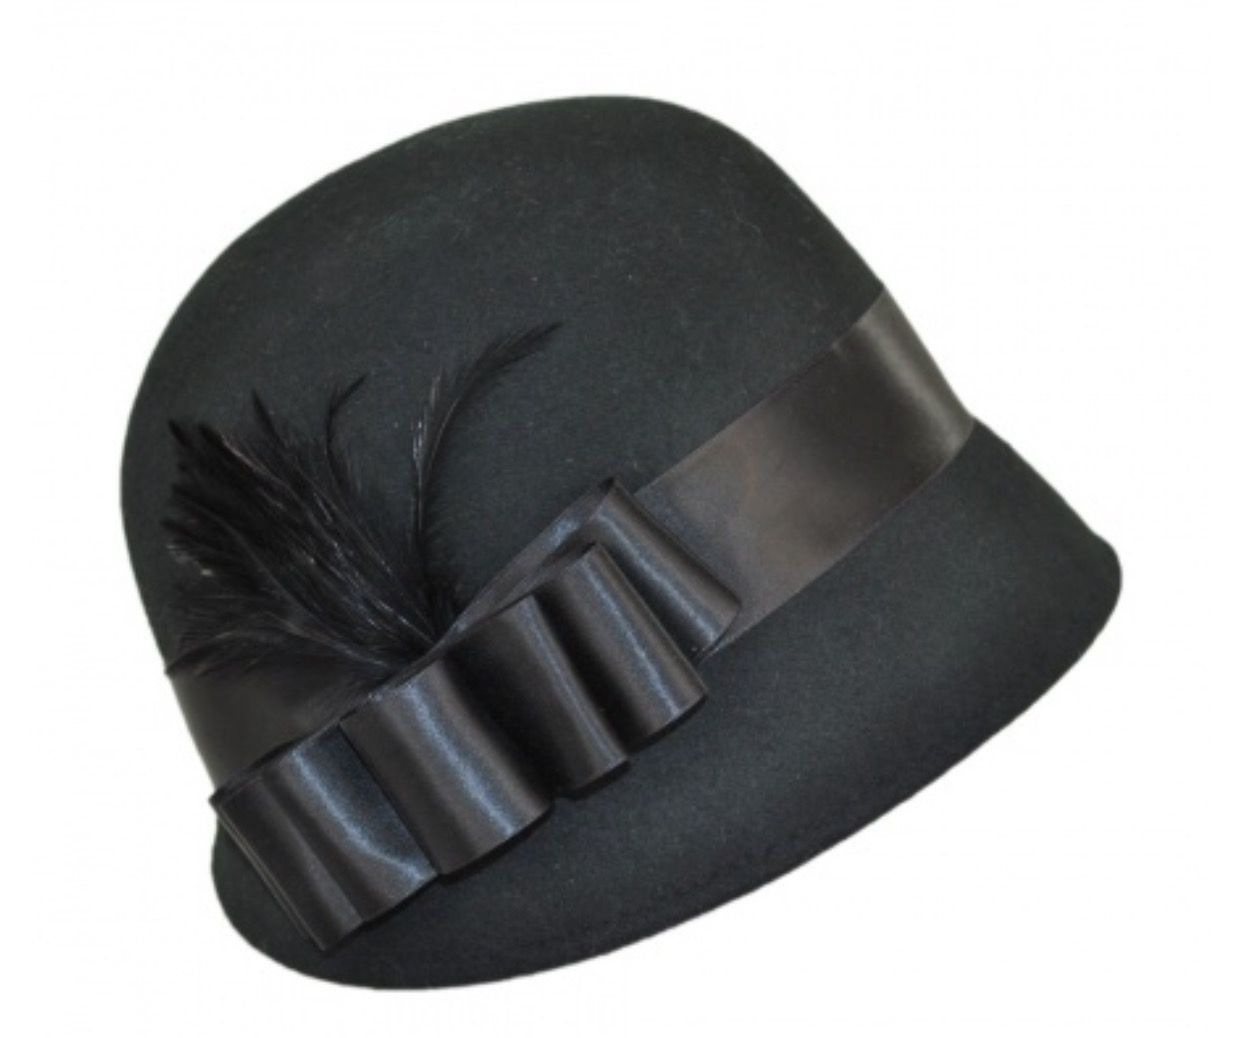 http   www.villagehatshop.com product cloche-flapper-hats  451139-418343 betmar-alexandrite-cloche-hat.html 6c0122d859e